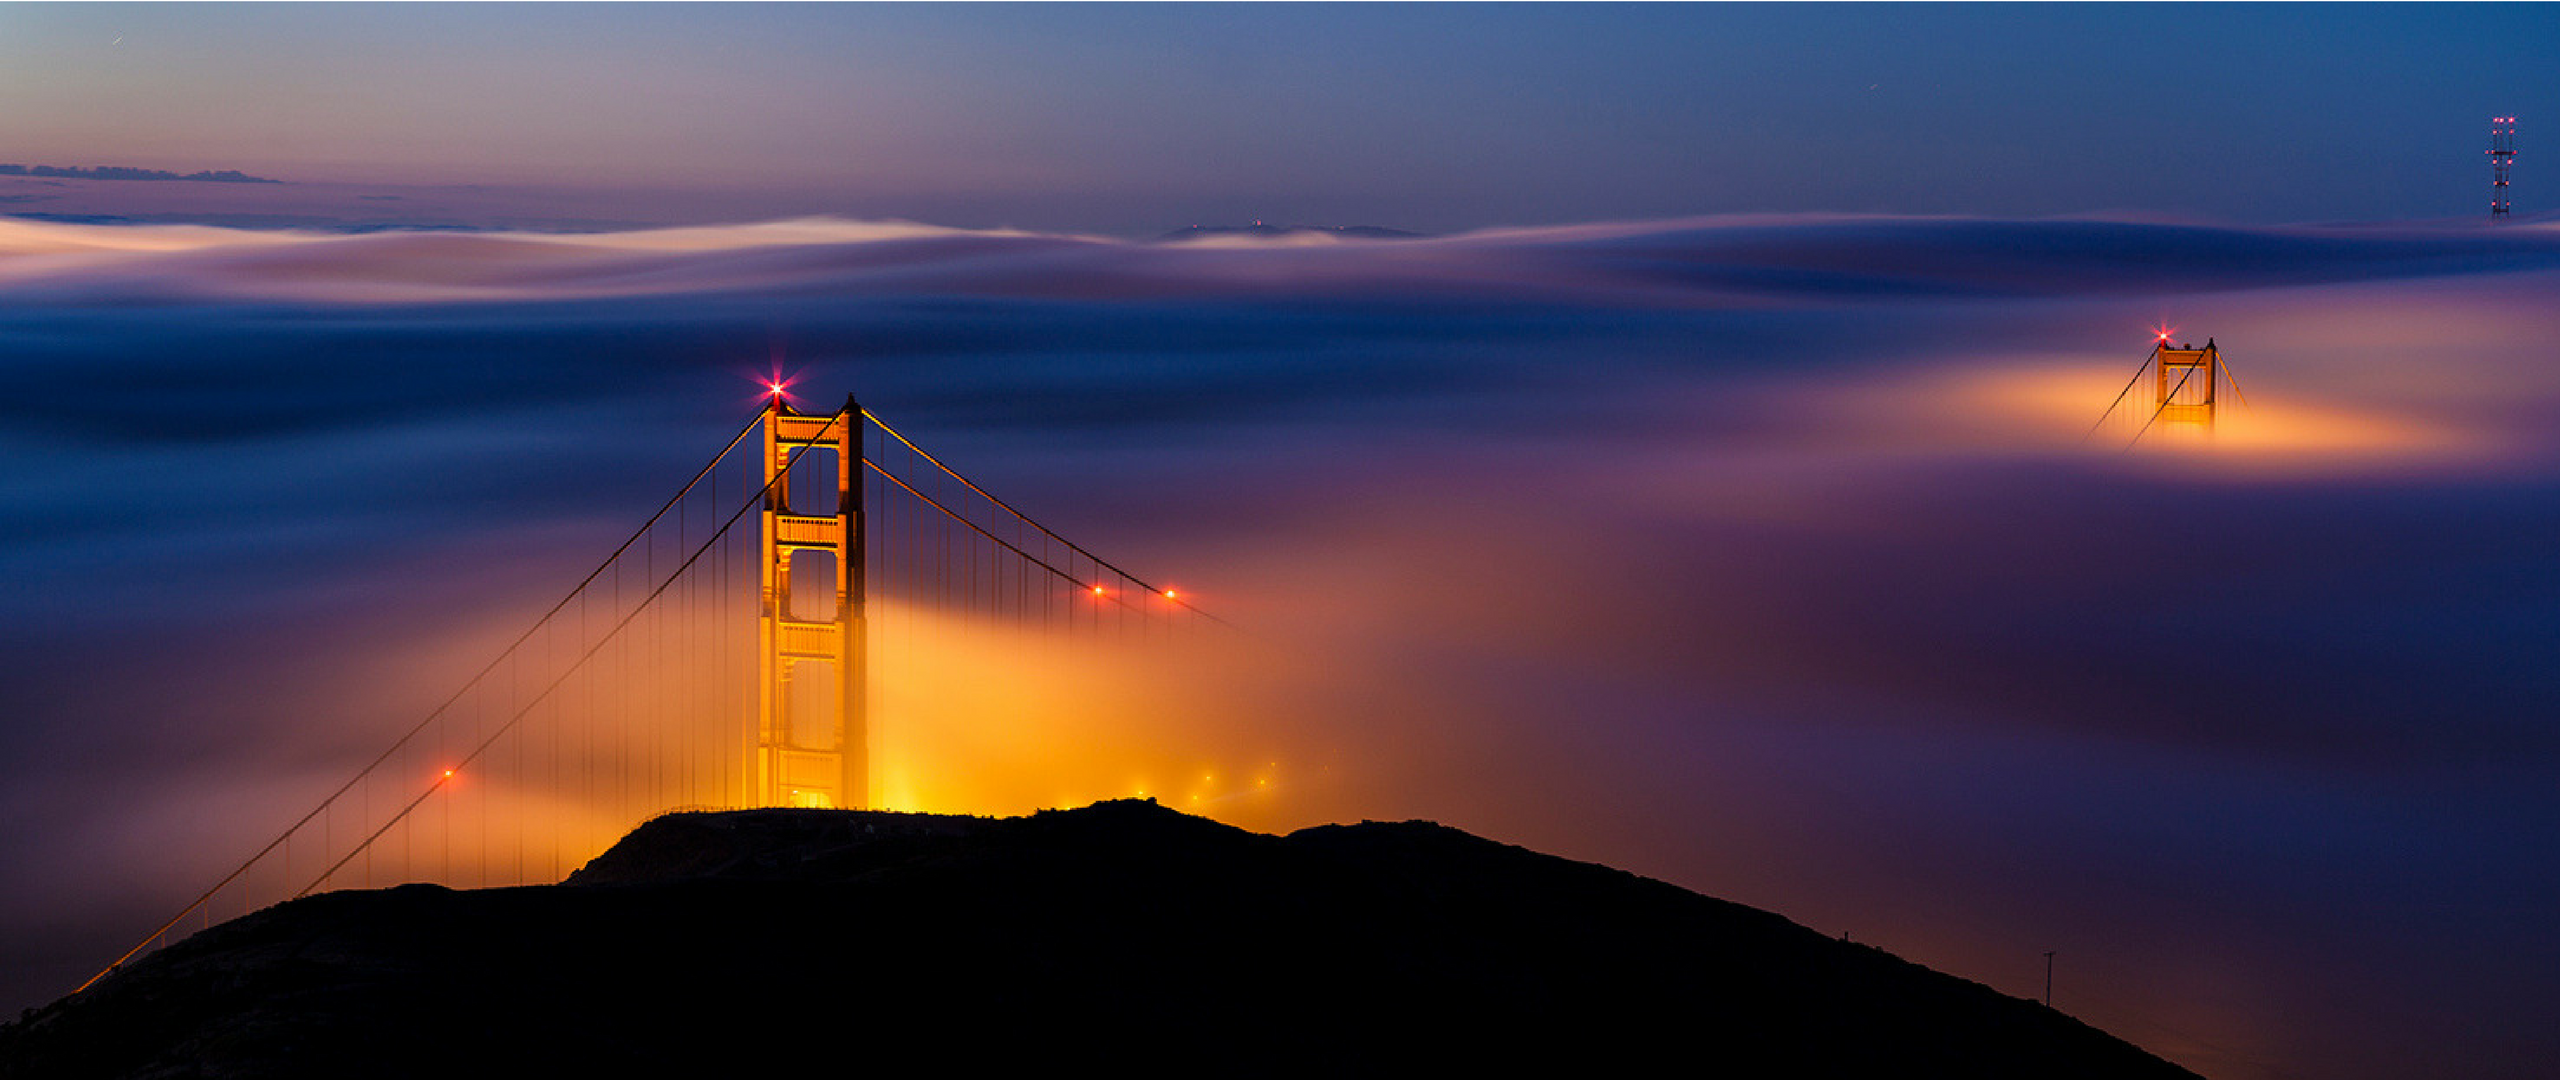 Wallpaper The World Below | San Francisco California [2560x1080] | High Quality Wallpapers | San ...